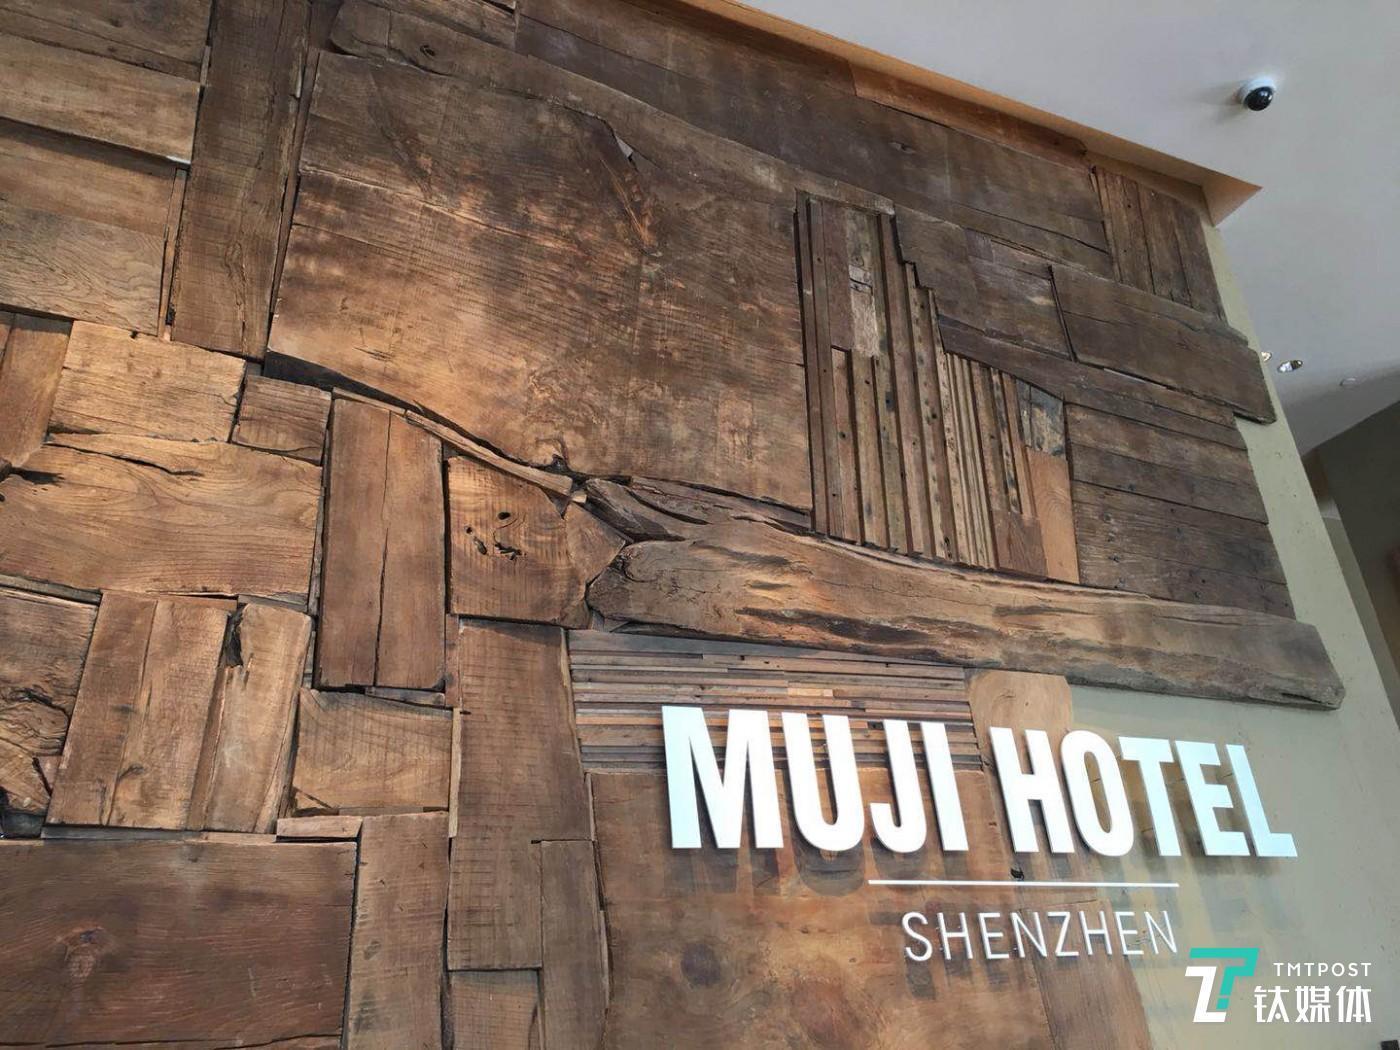 MUJI HOTEL 二楼前台处,旧木块被拼接成背景墙。